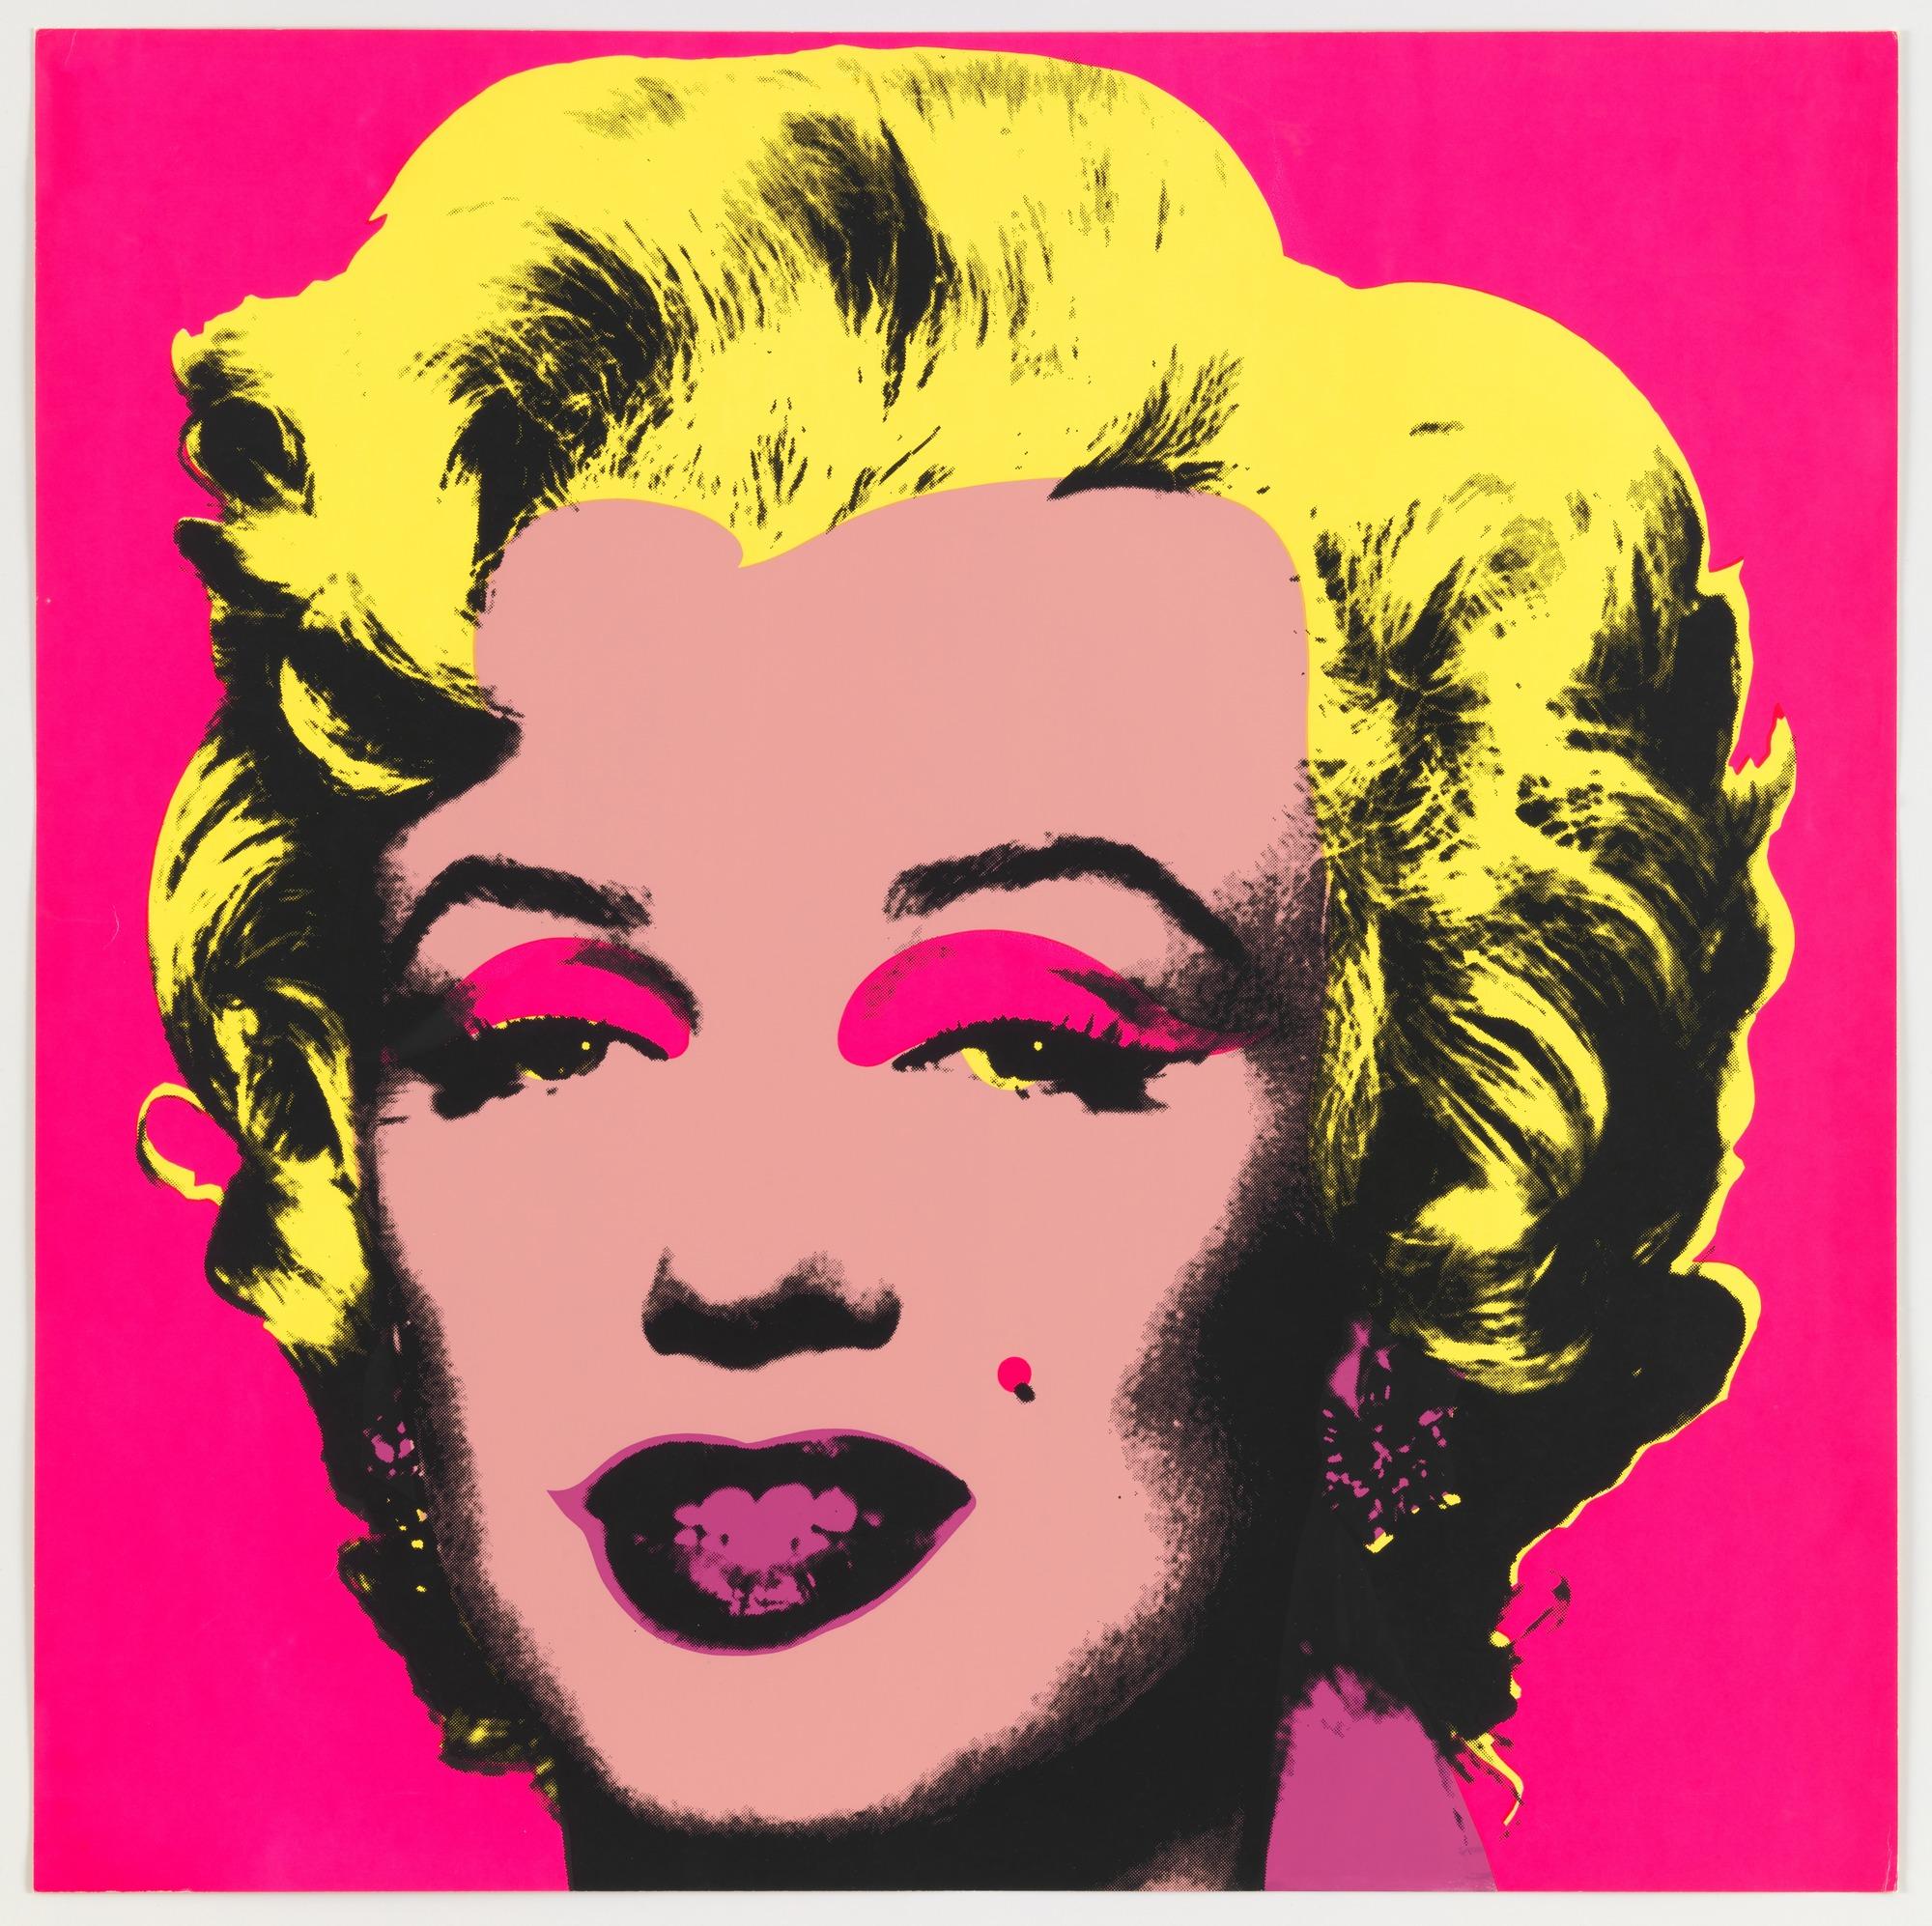 Andy Warhol - İsimsiz Marilyn Monroe (1967)